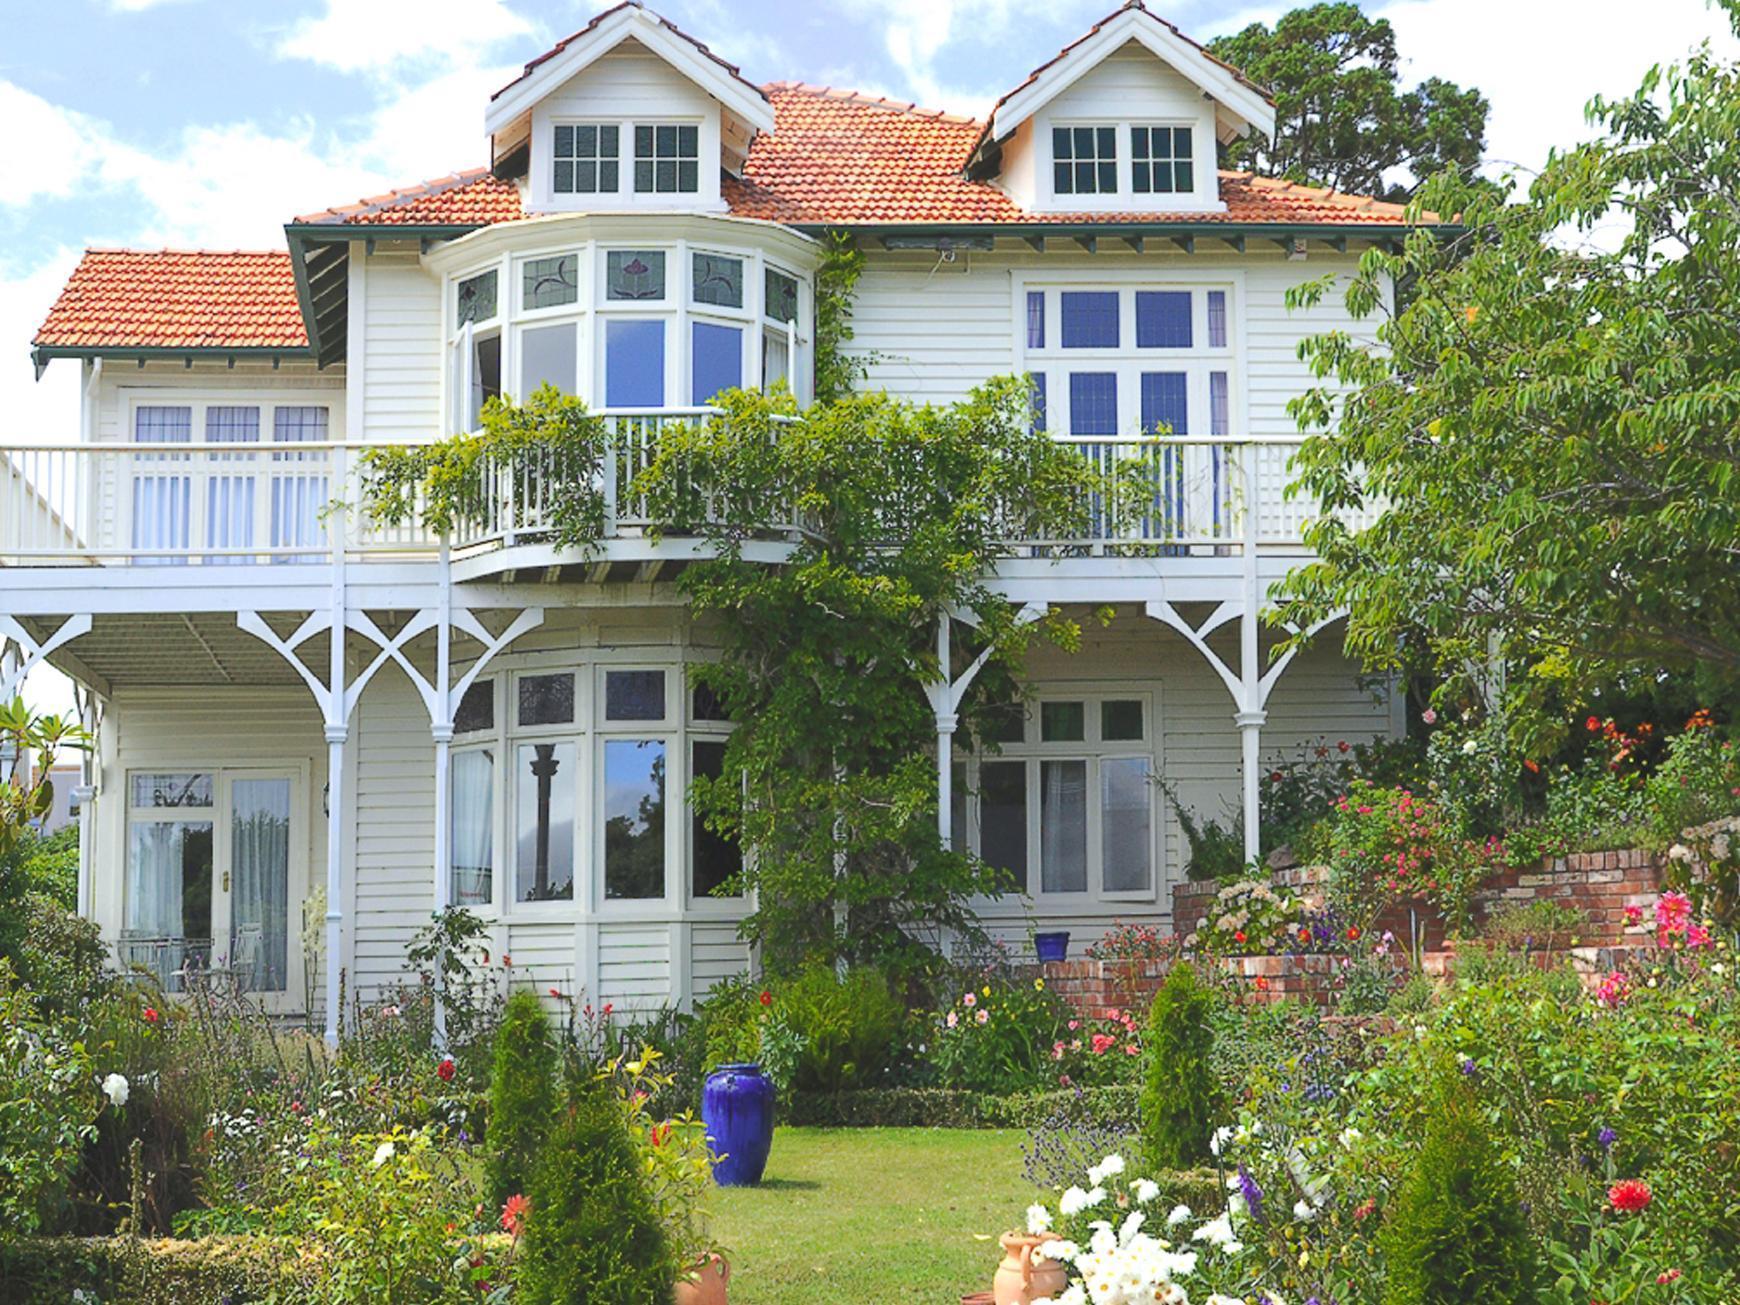 dyers house in christchurch room deals photos reviews rh agoda com